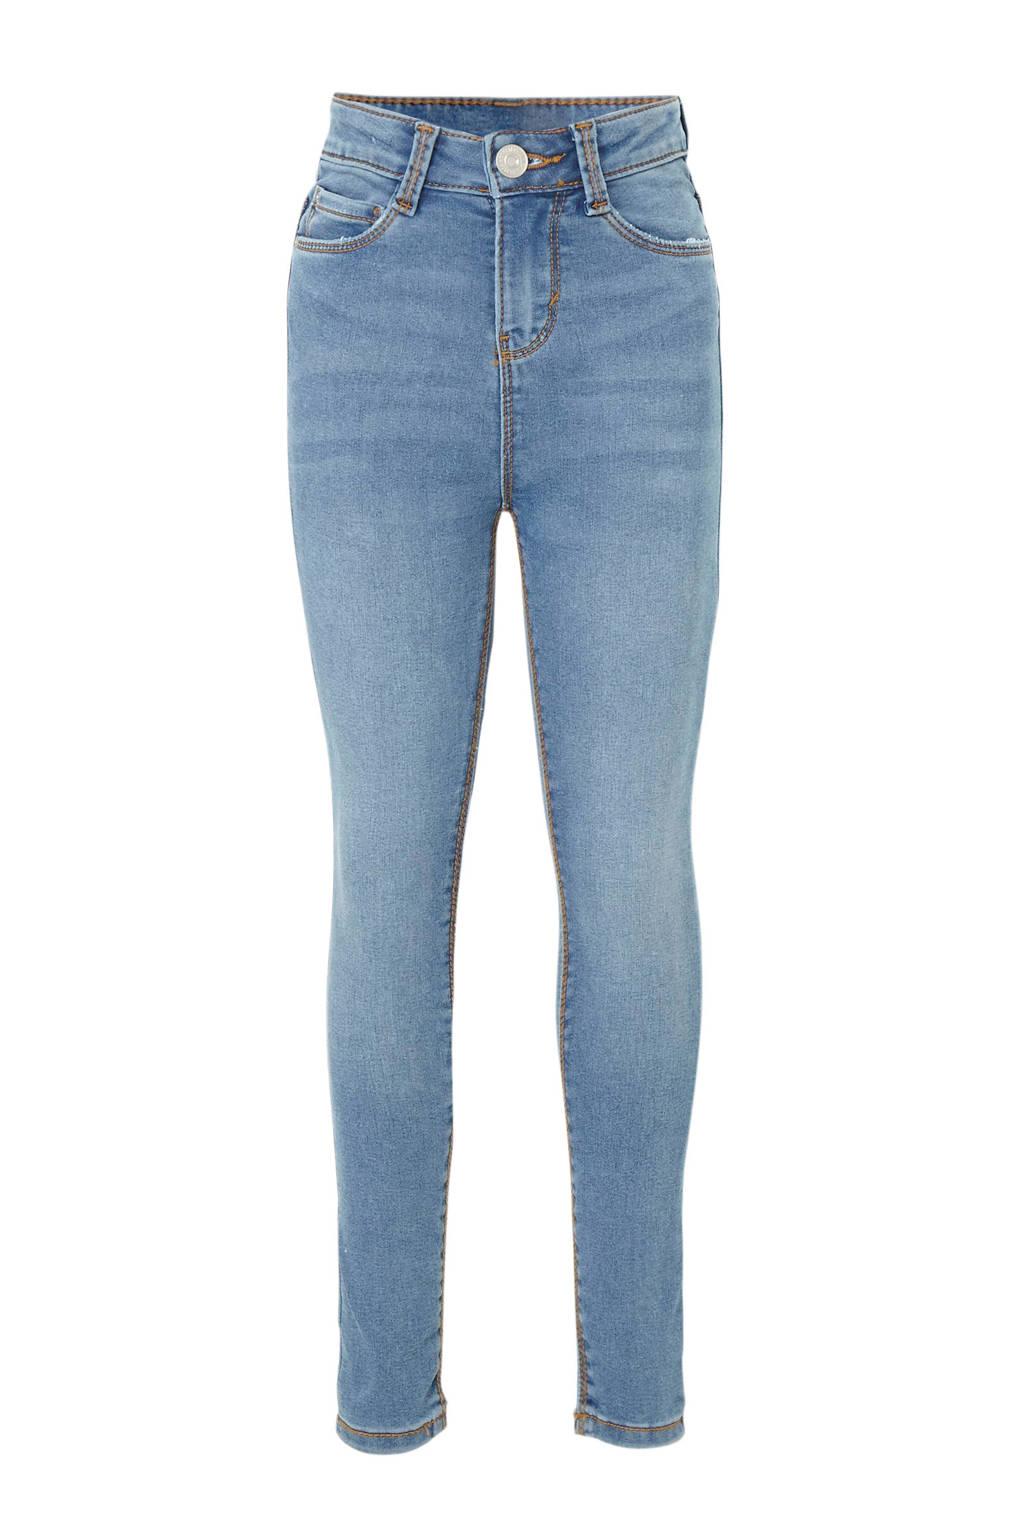 C&A Here & There skinny jeans light denim, Light denim